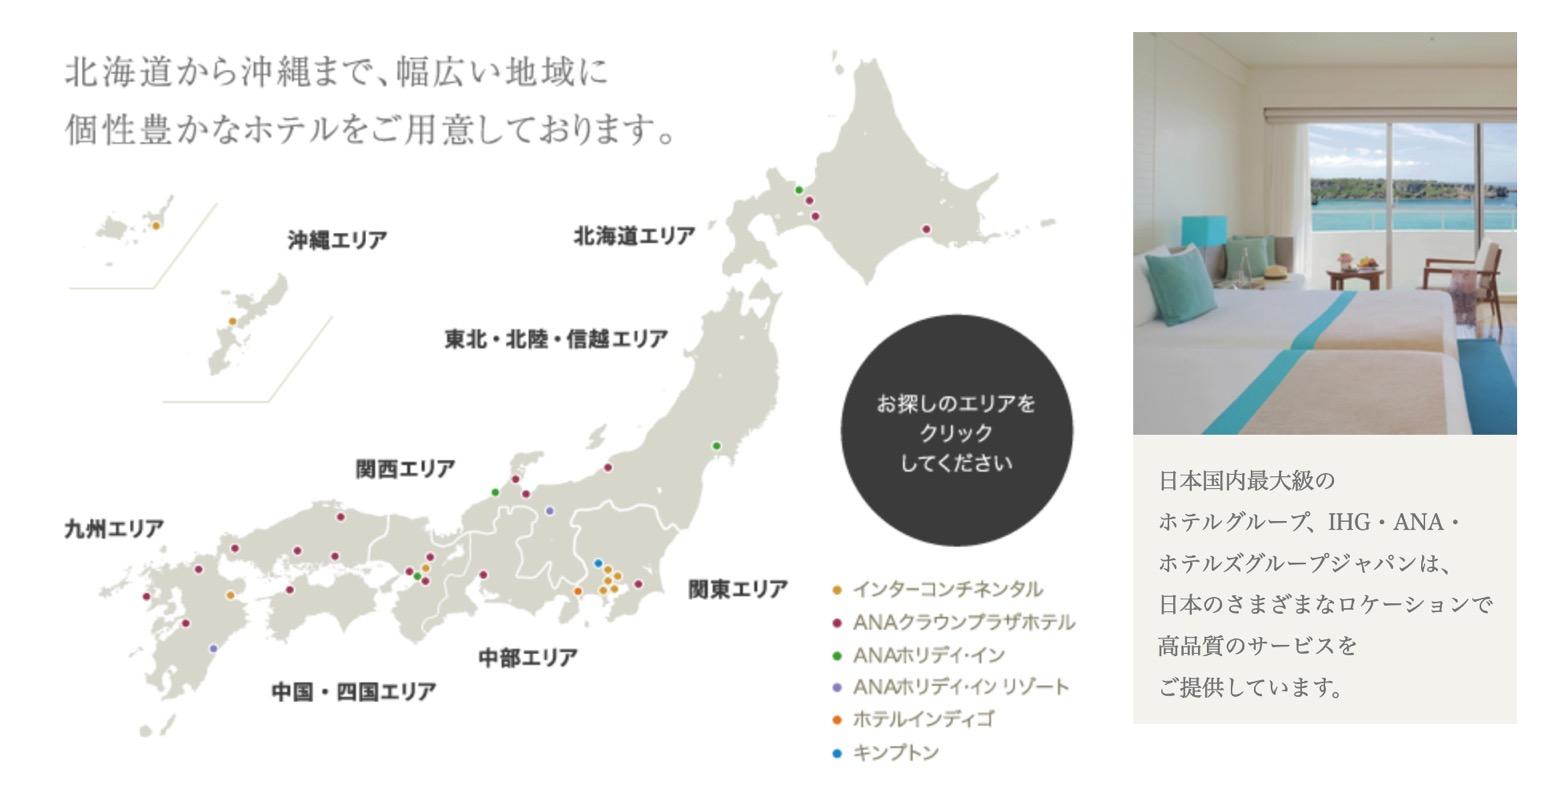 IHGの日本国内展開ブランド